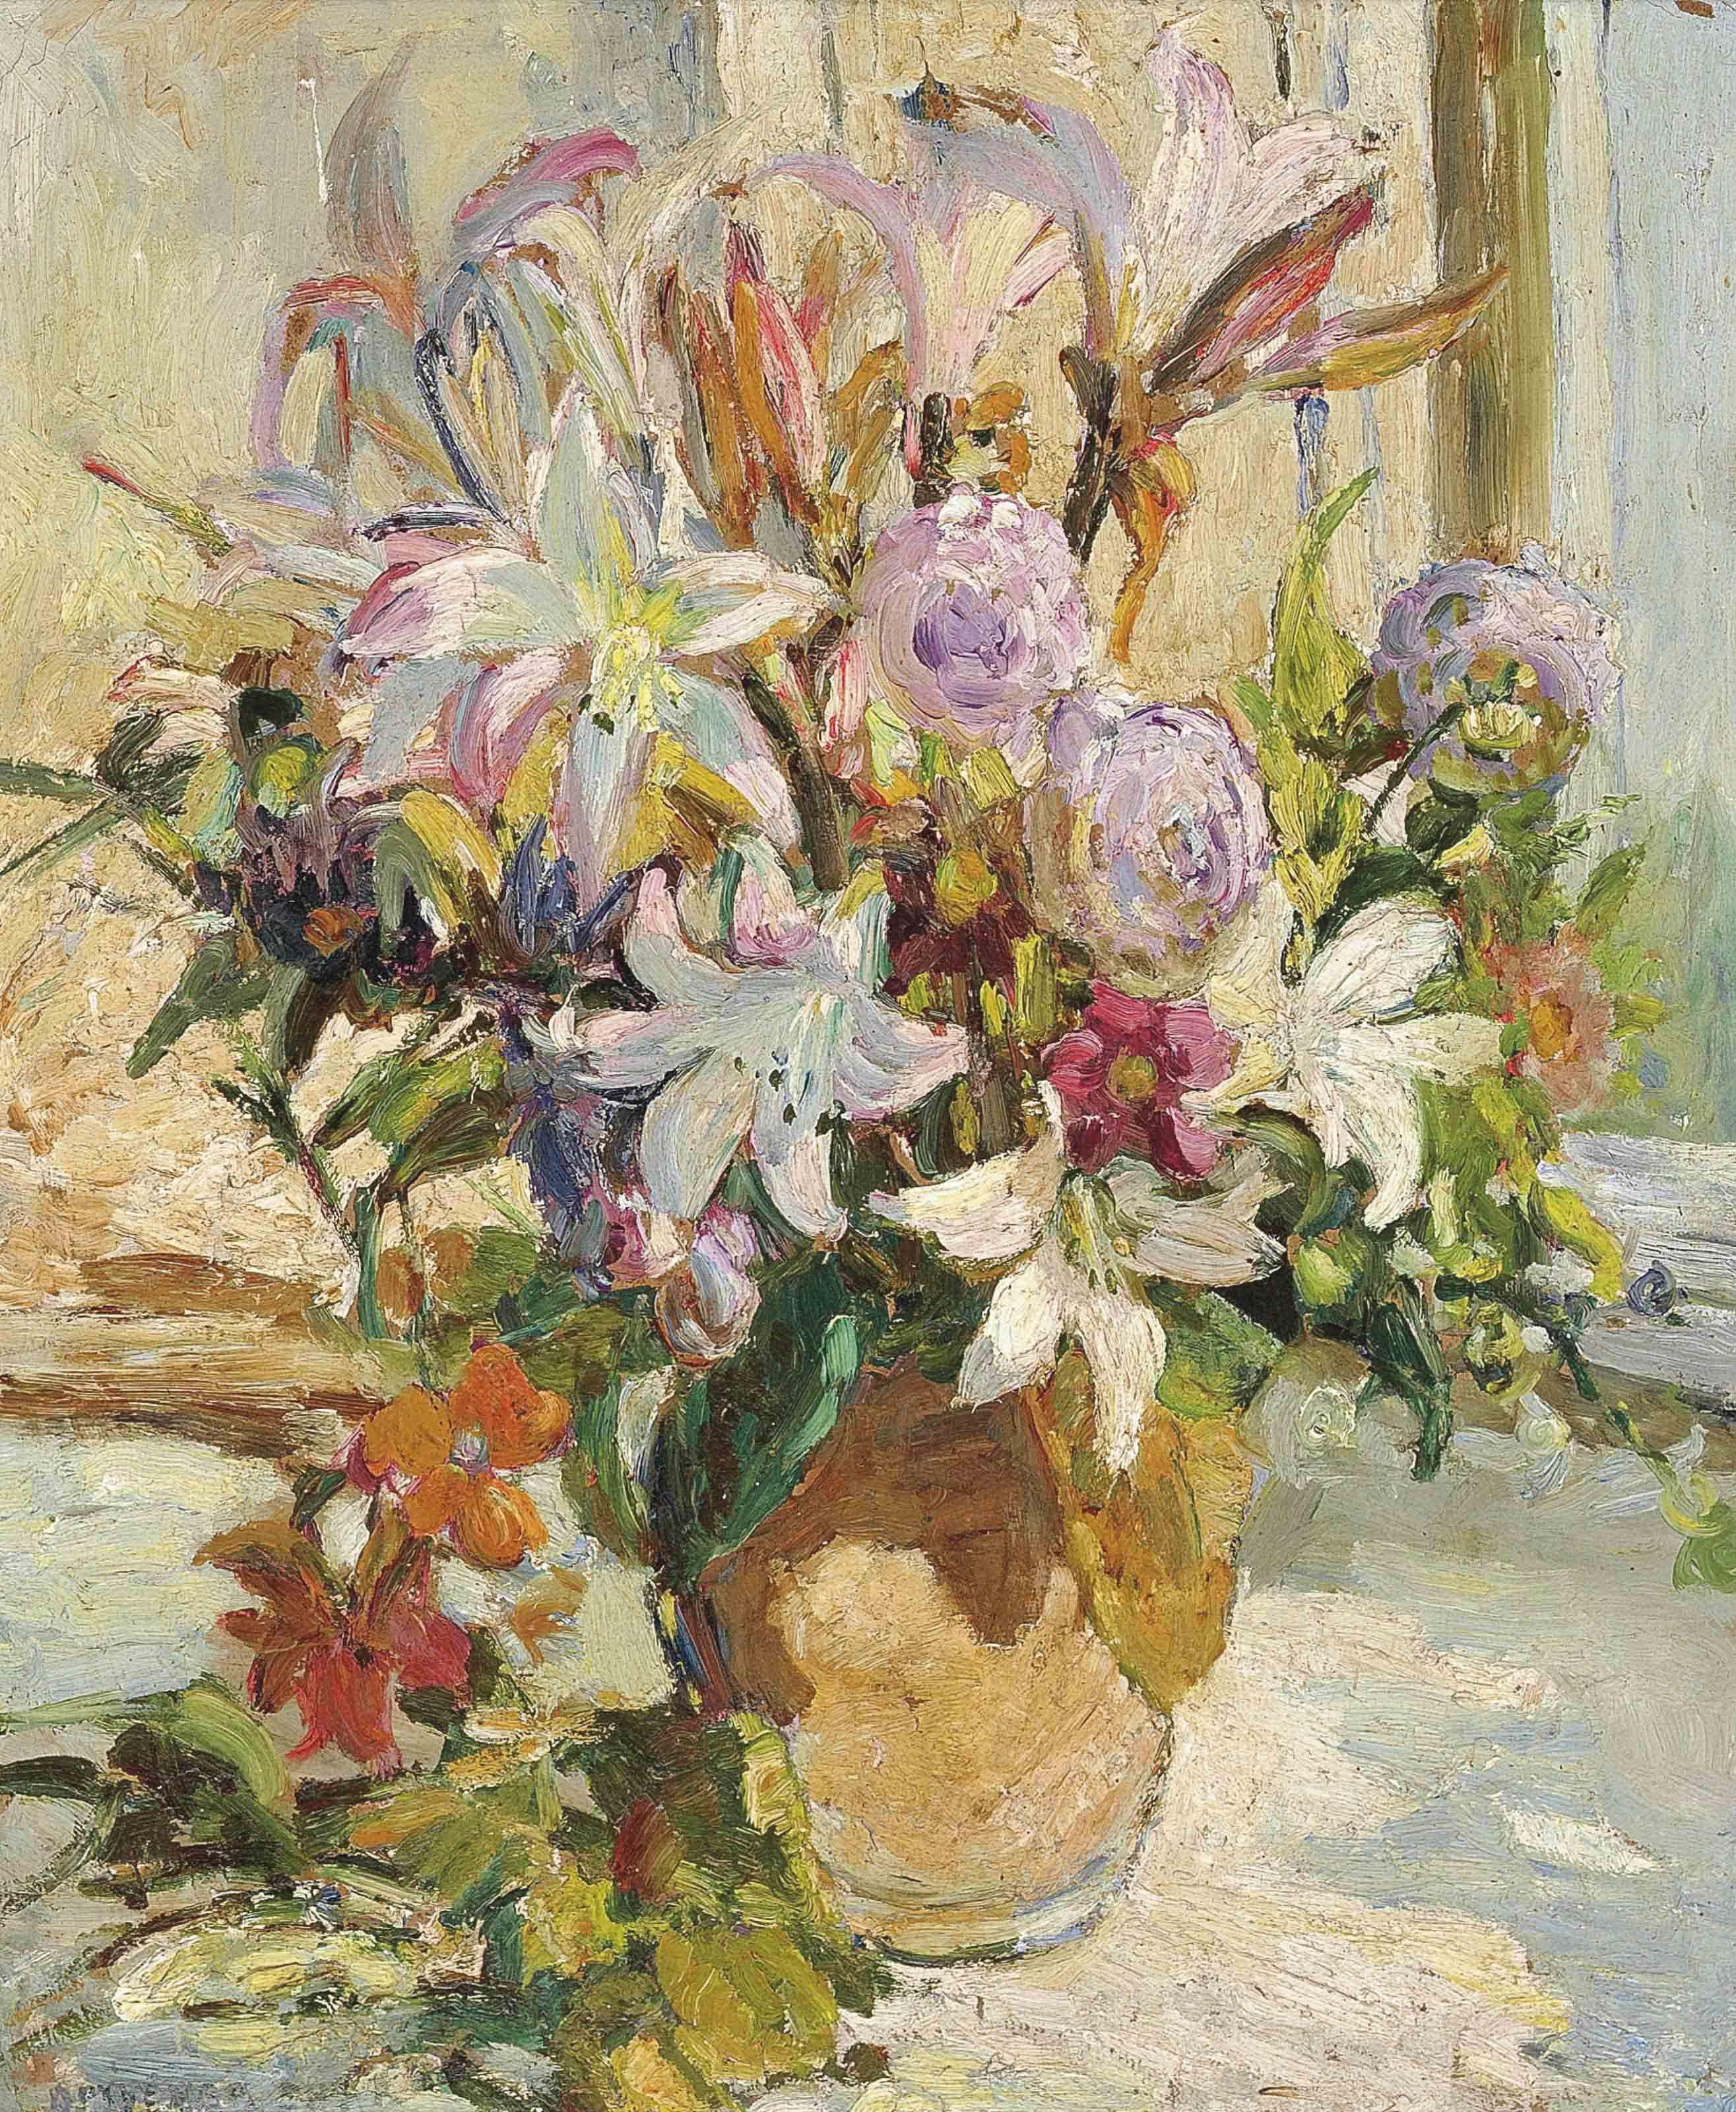 Dorothea Sharp, R.B.A., R.O.I.